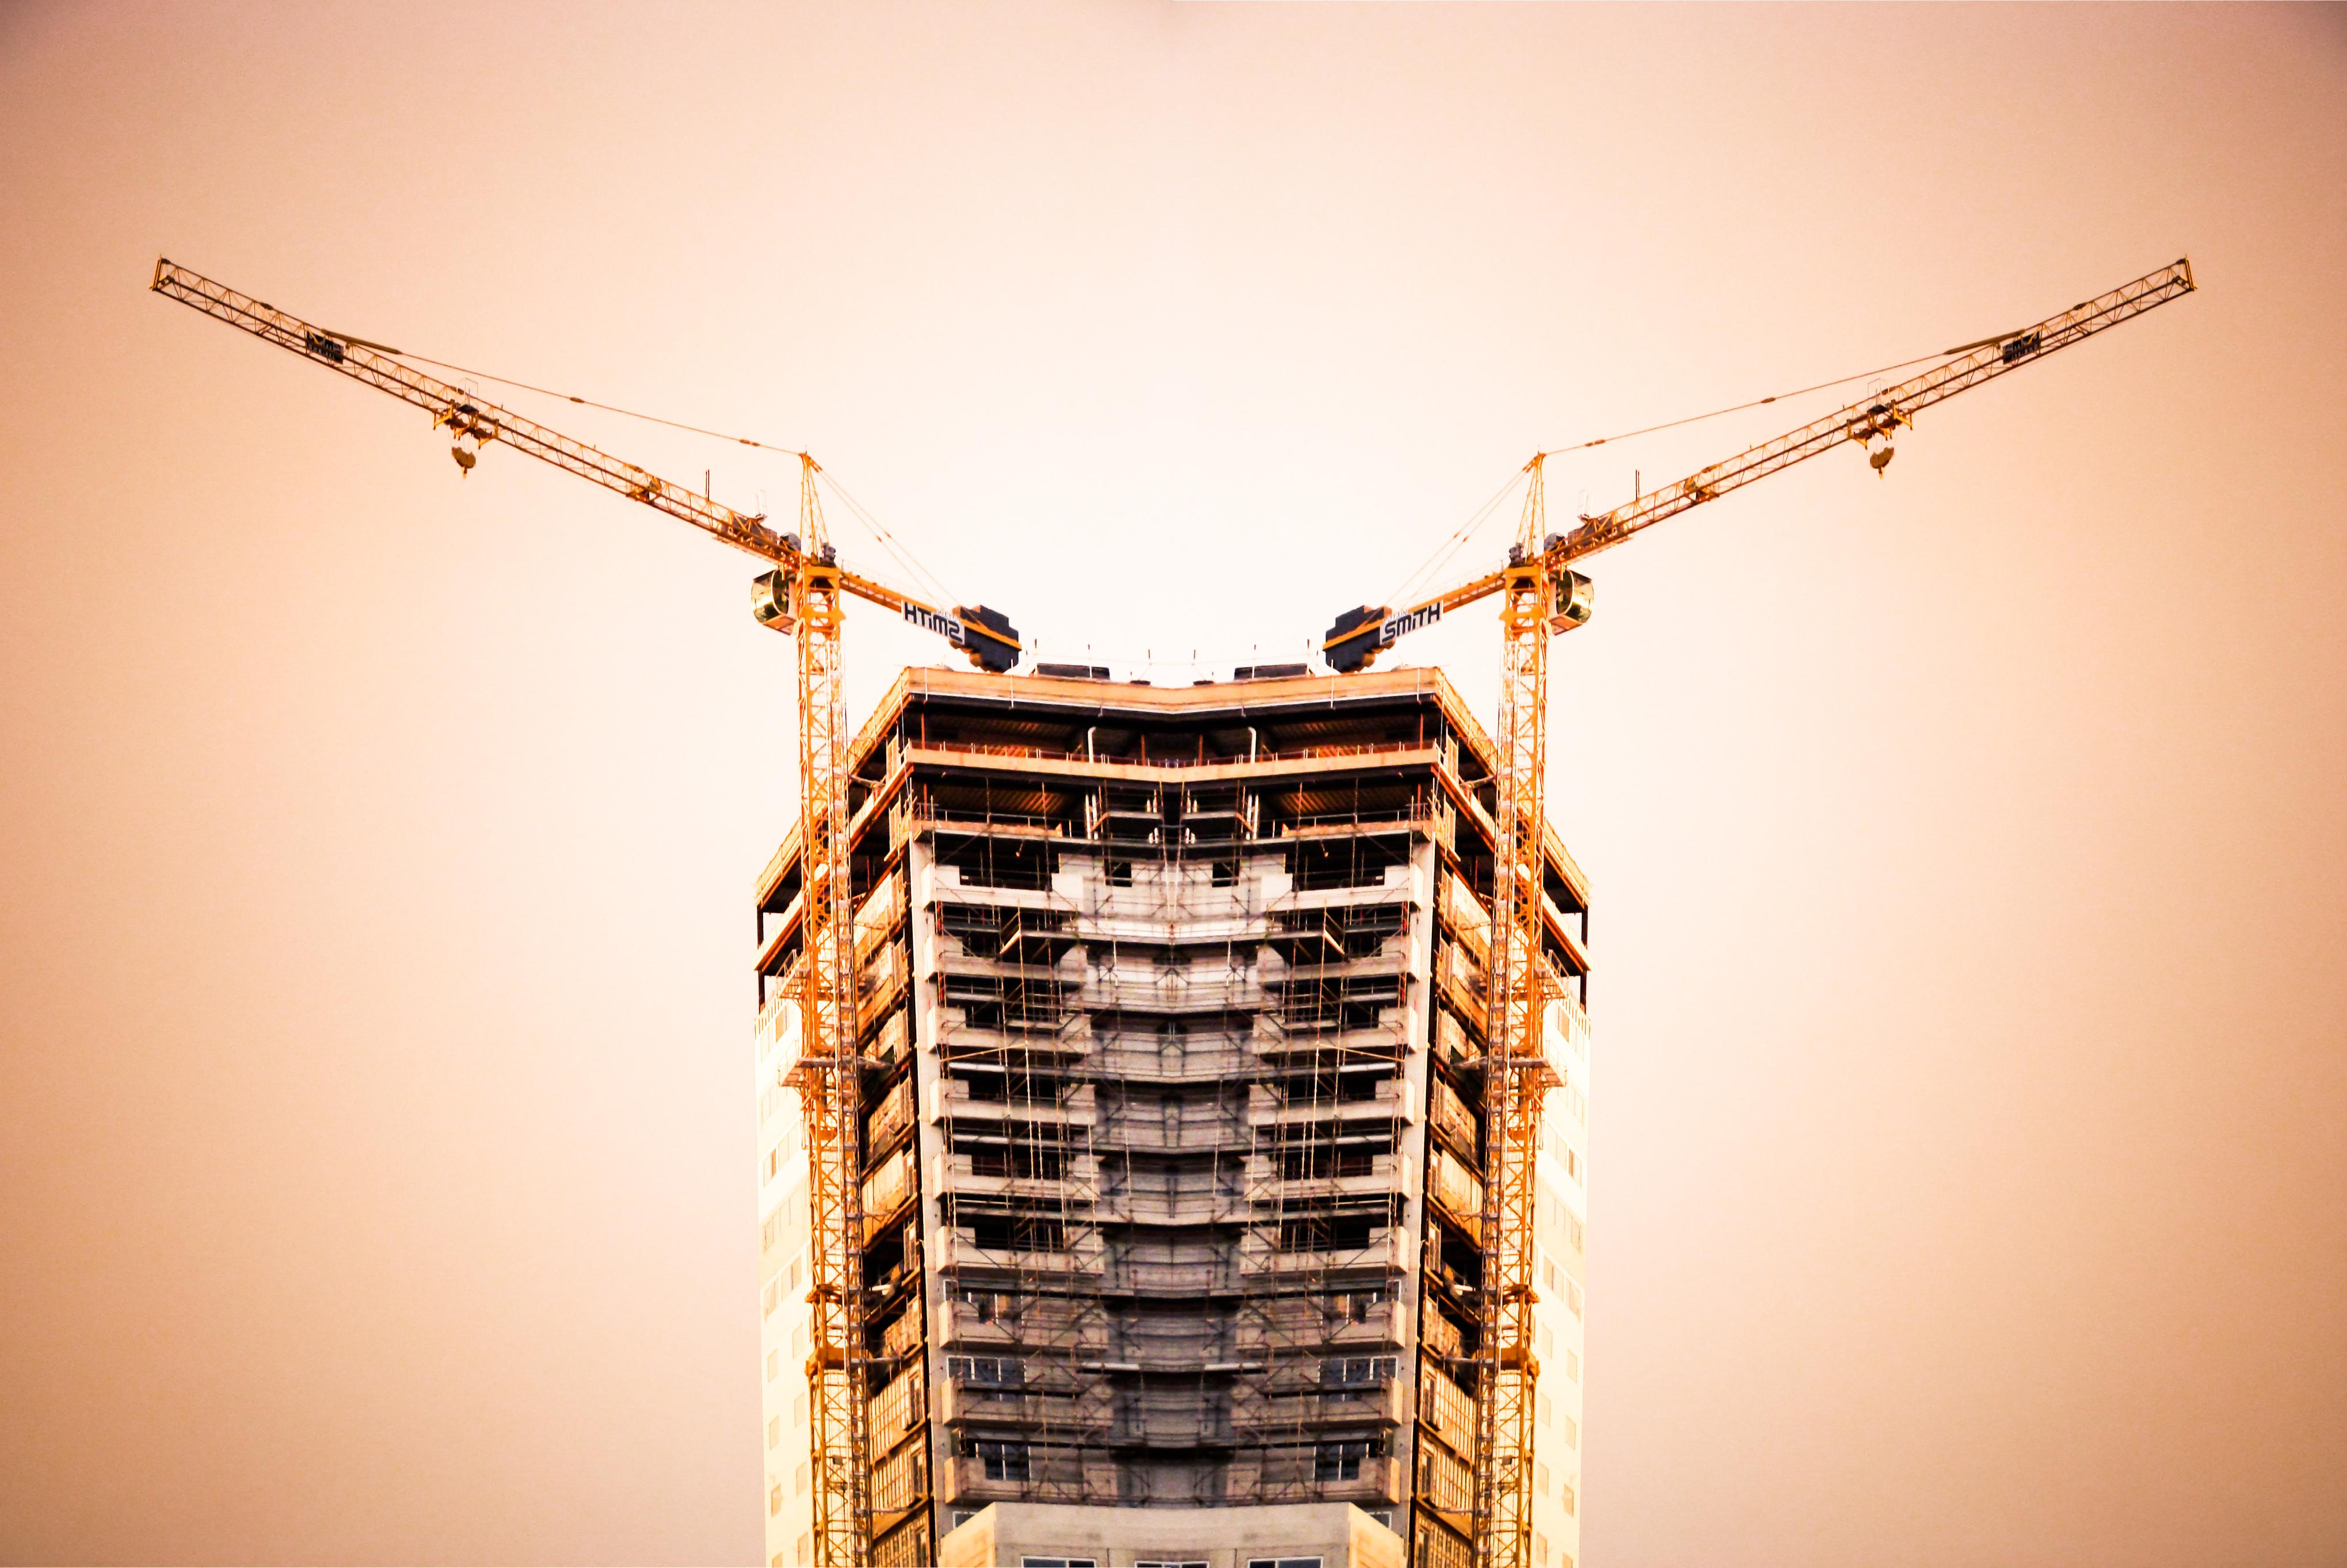 crane+reversed-16+small